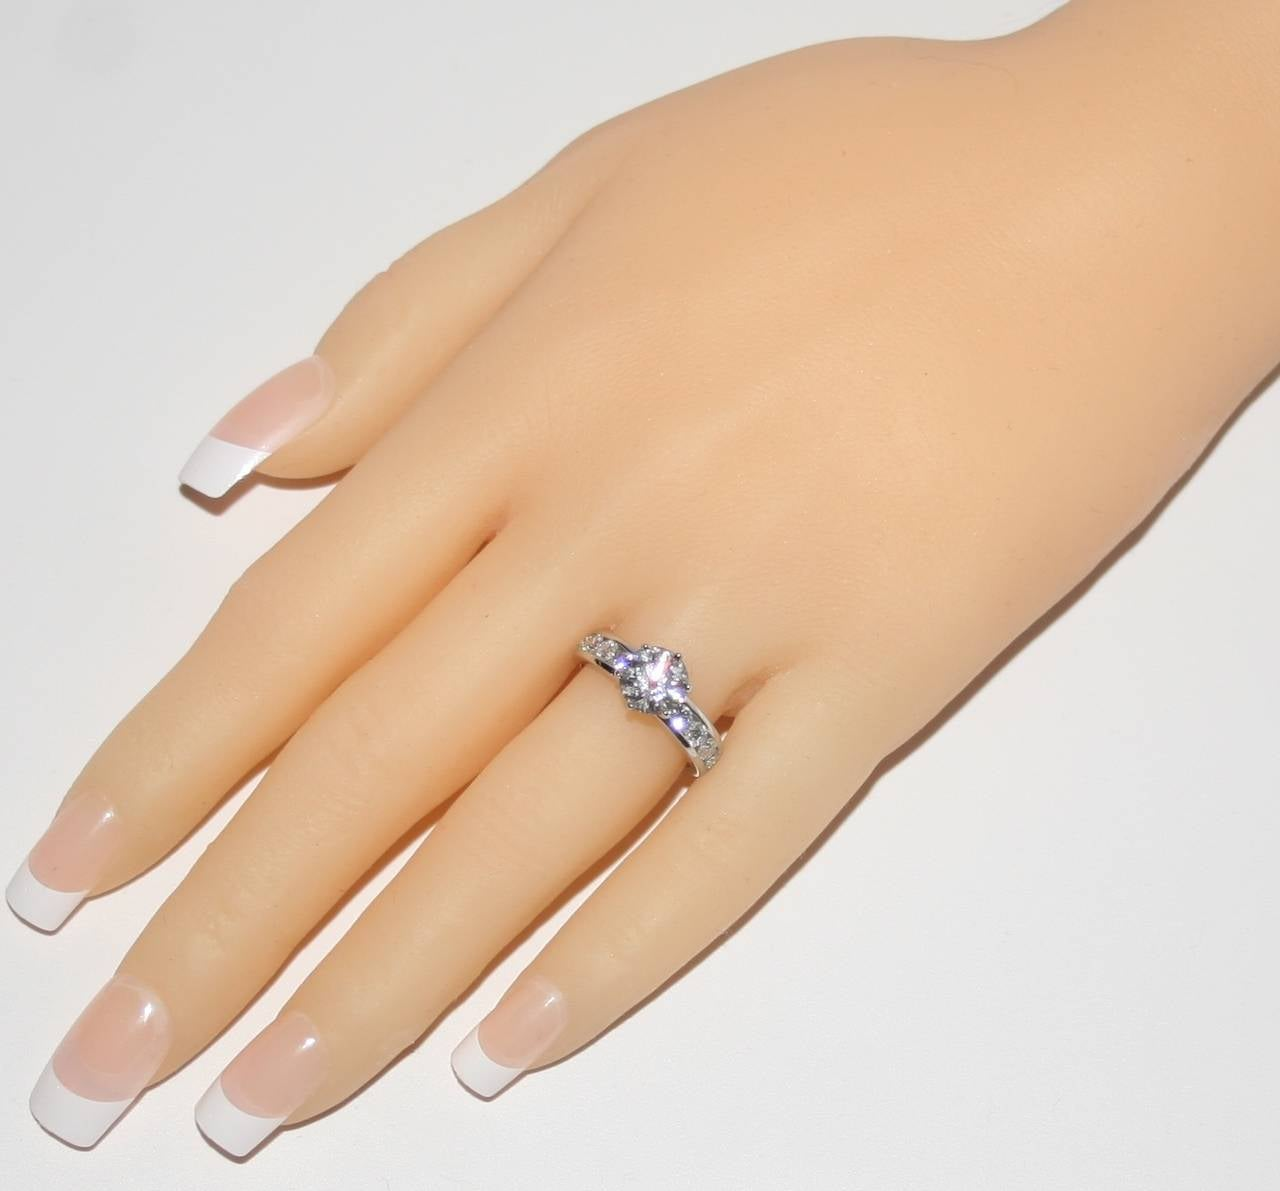 Tiffany & Co. 1.71 Carat F IF Diamond Platinum Ring 5